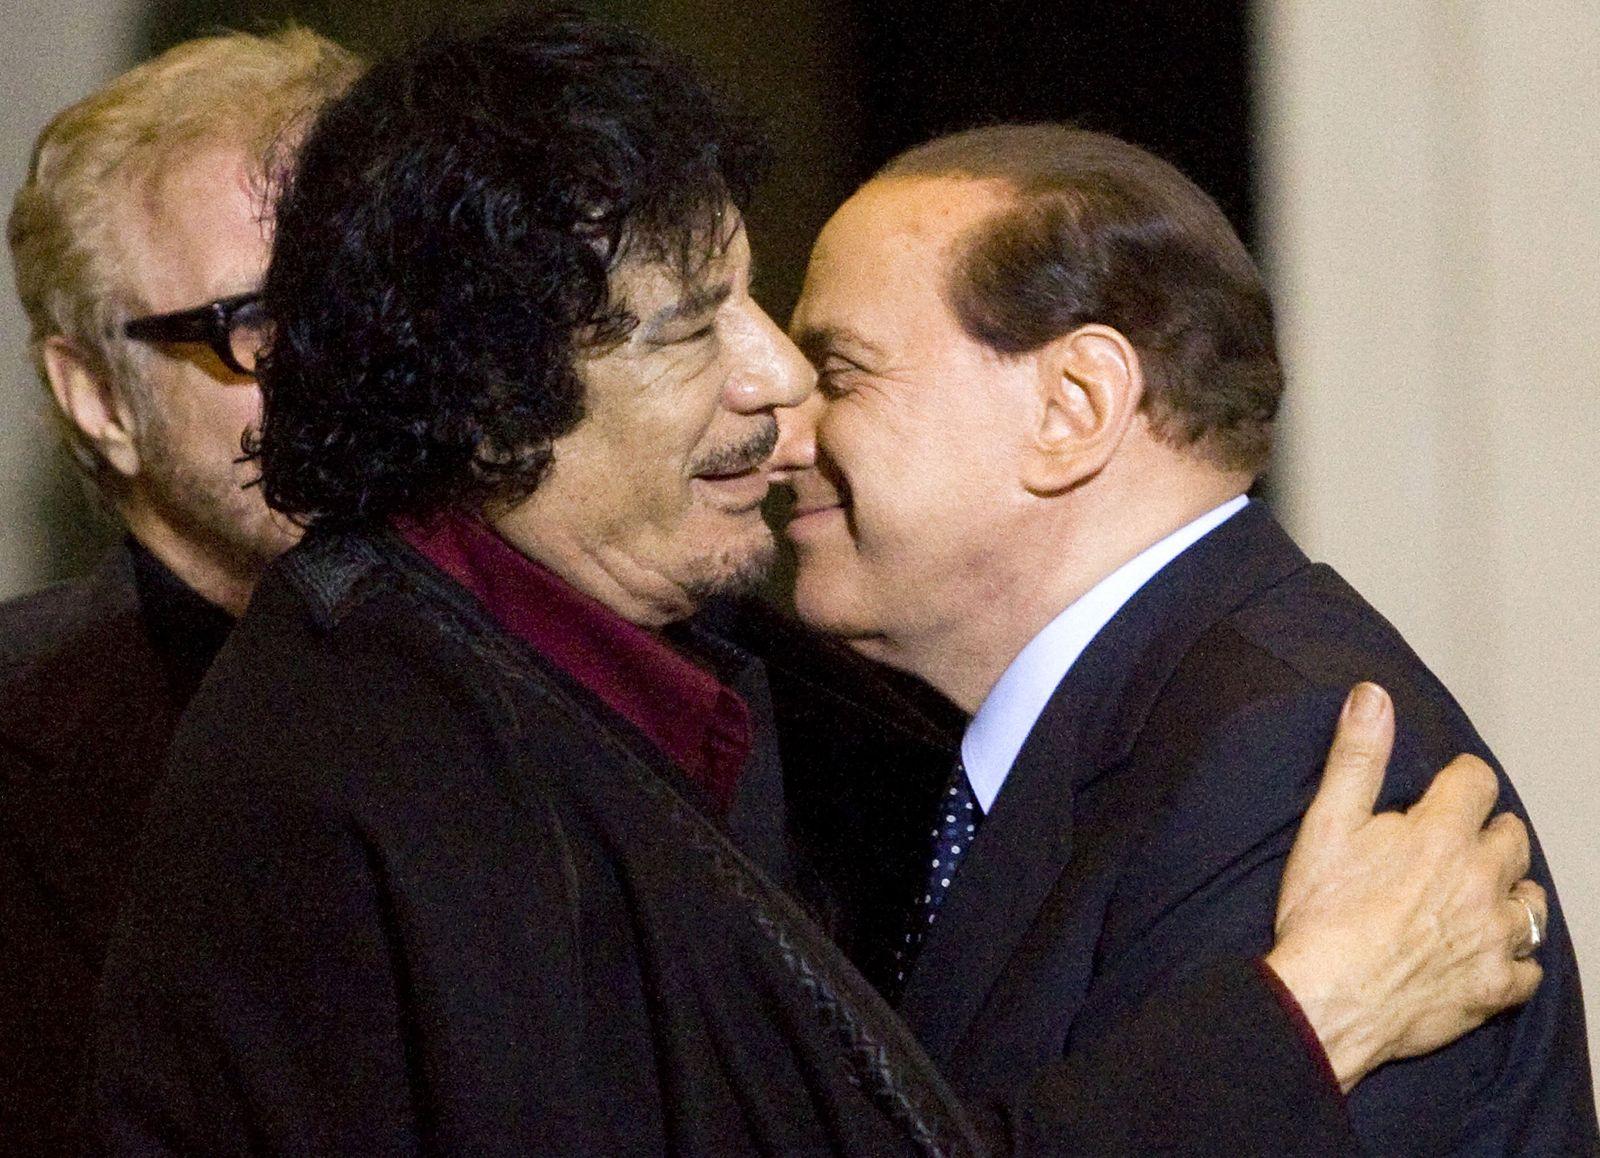 ITALY-LIBYA/BERLUSCONI gaddafi